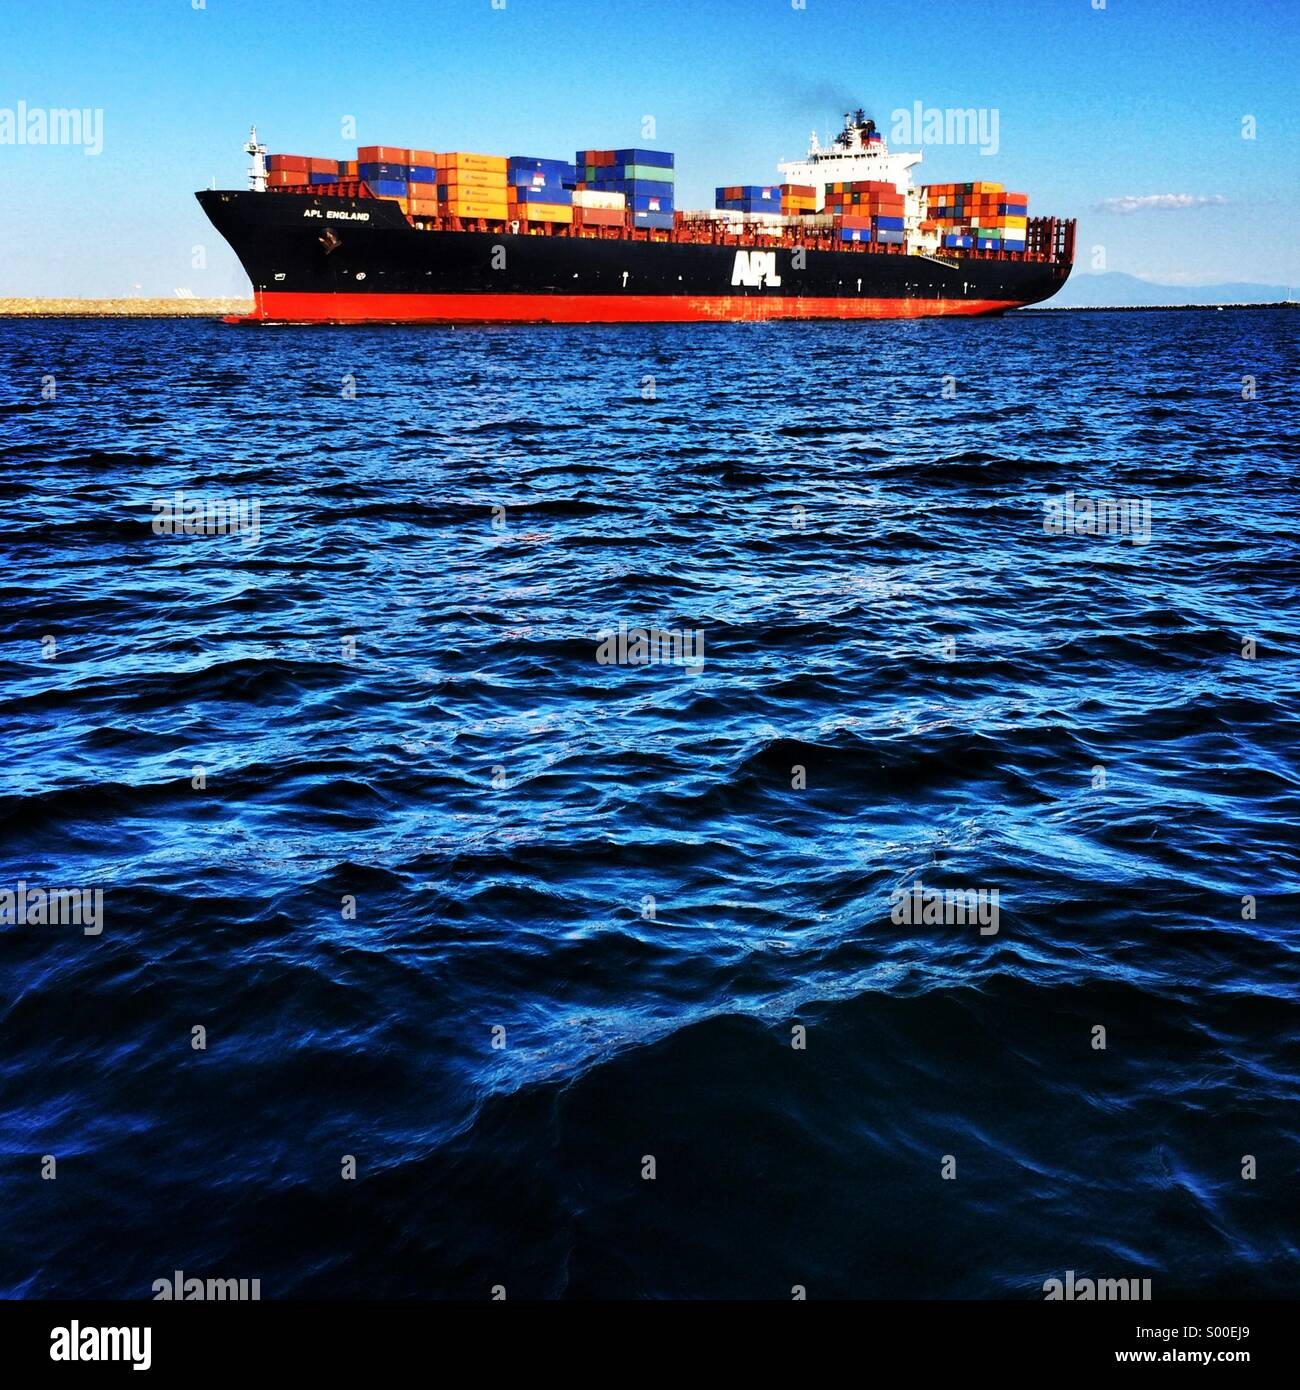 Tanker - Stock Image